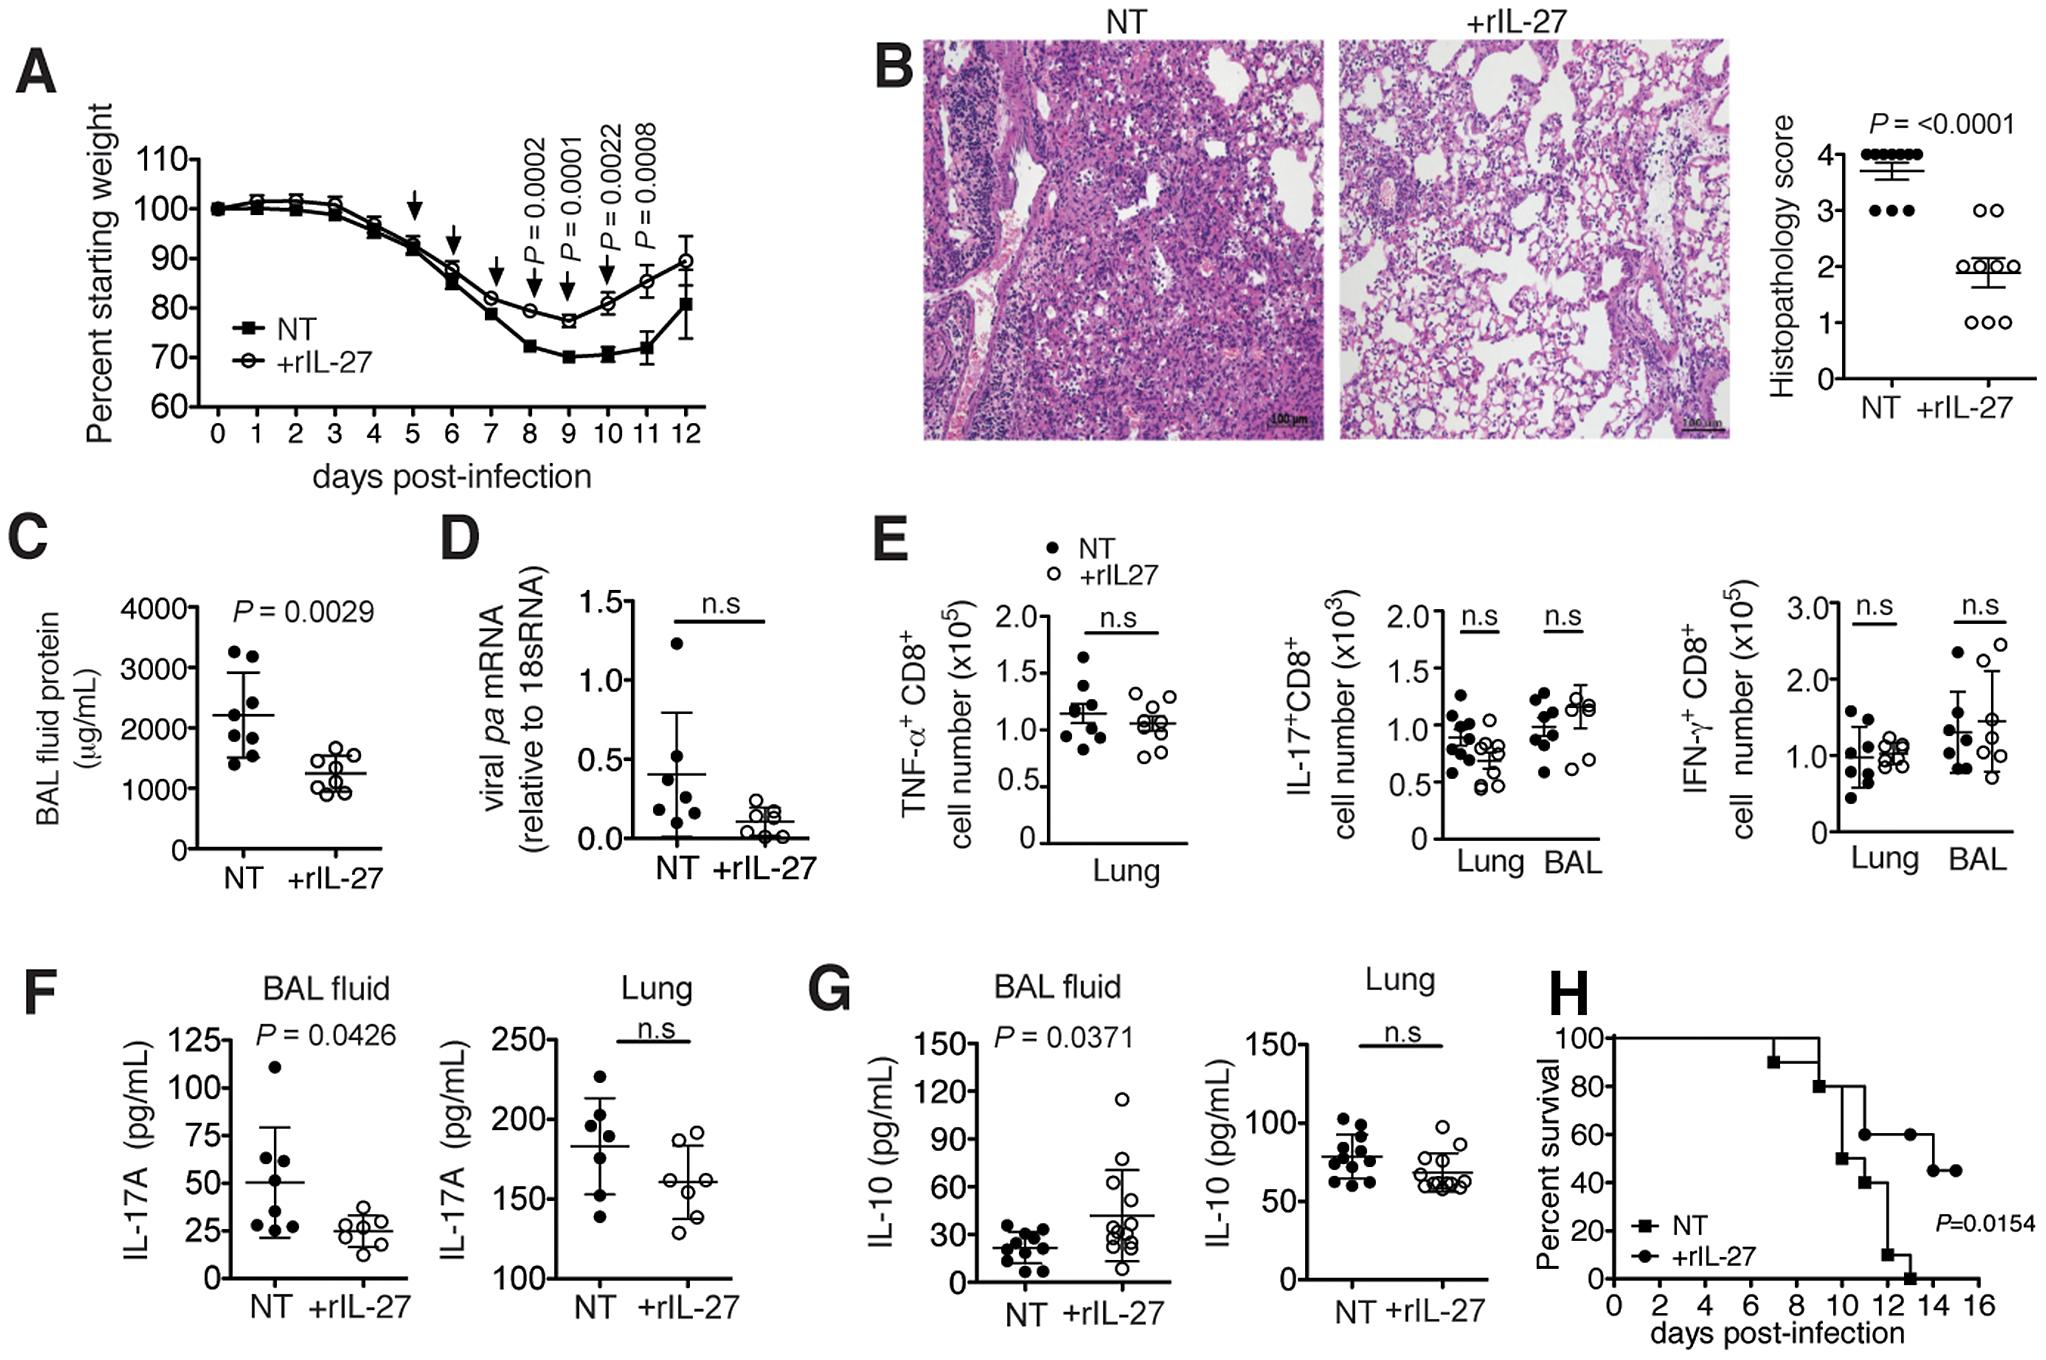 Late-phase treatment with rIL-27 alleviates lung immunopathology.